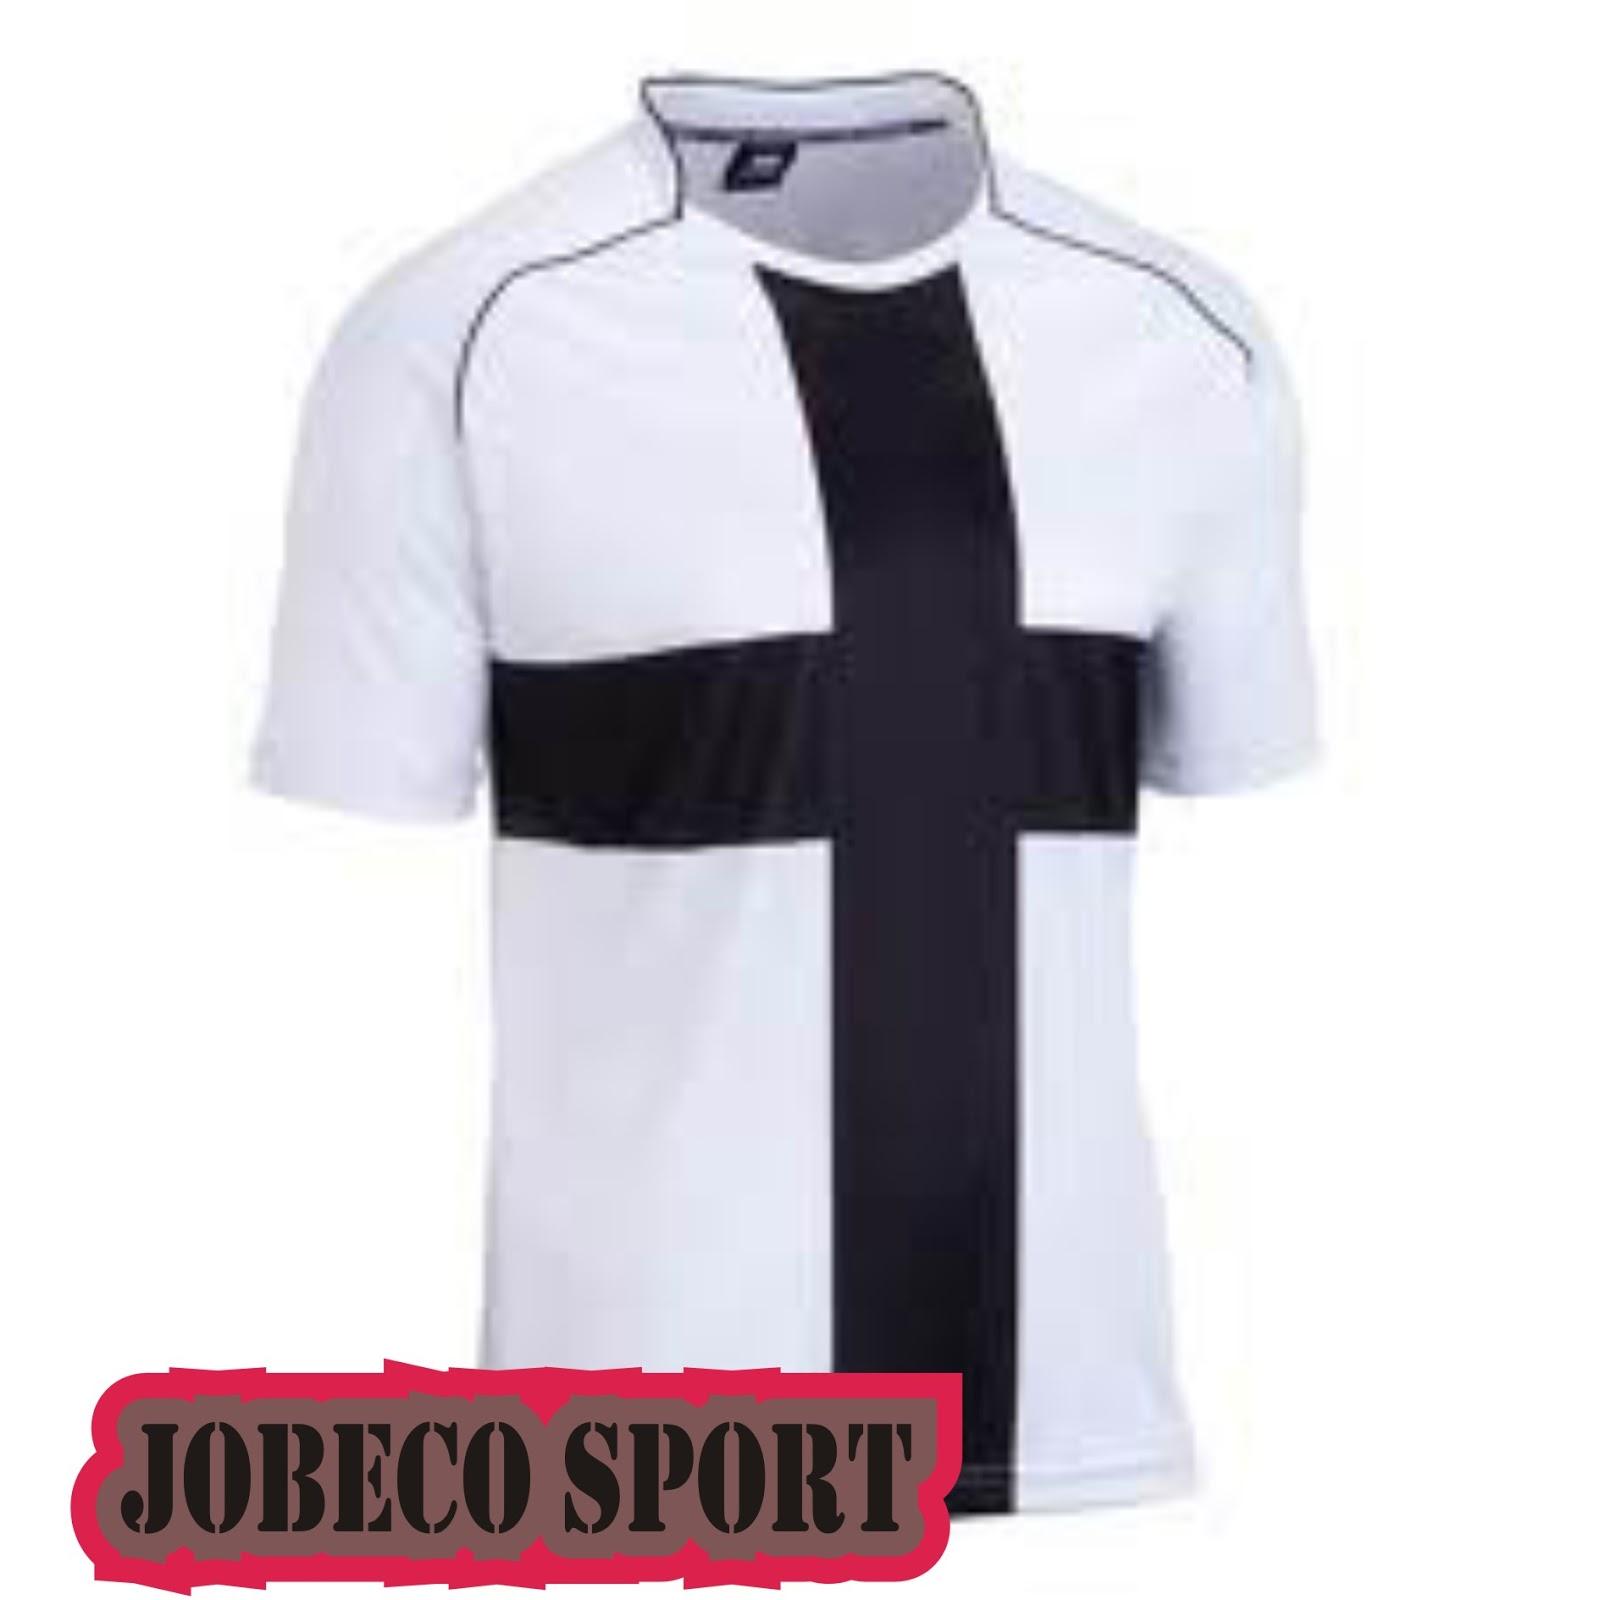 ... TEAM FUTSAL Baru (JOBECO SPORT) - KOSTUM FUTSAL & JAKET BASEBALL